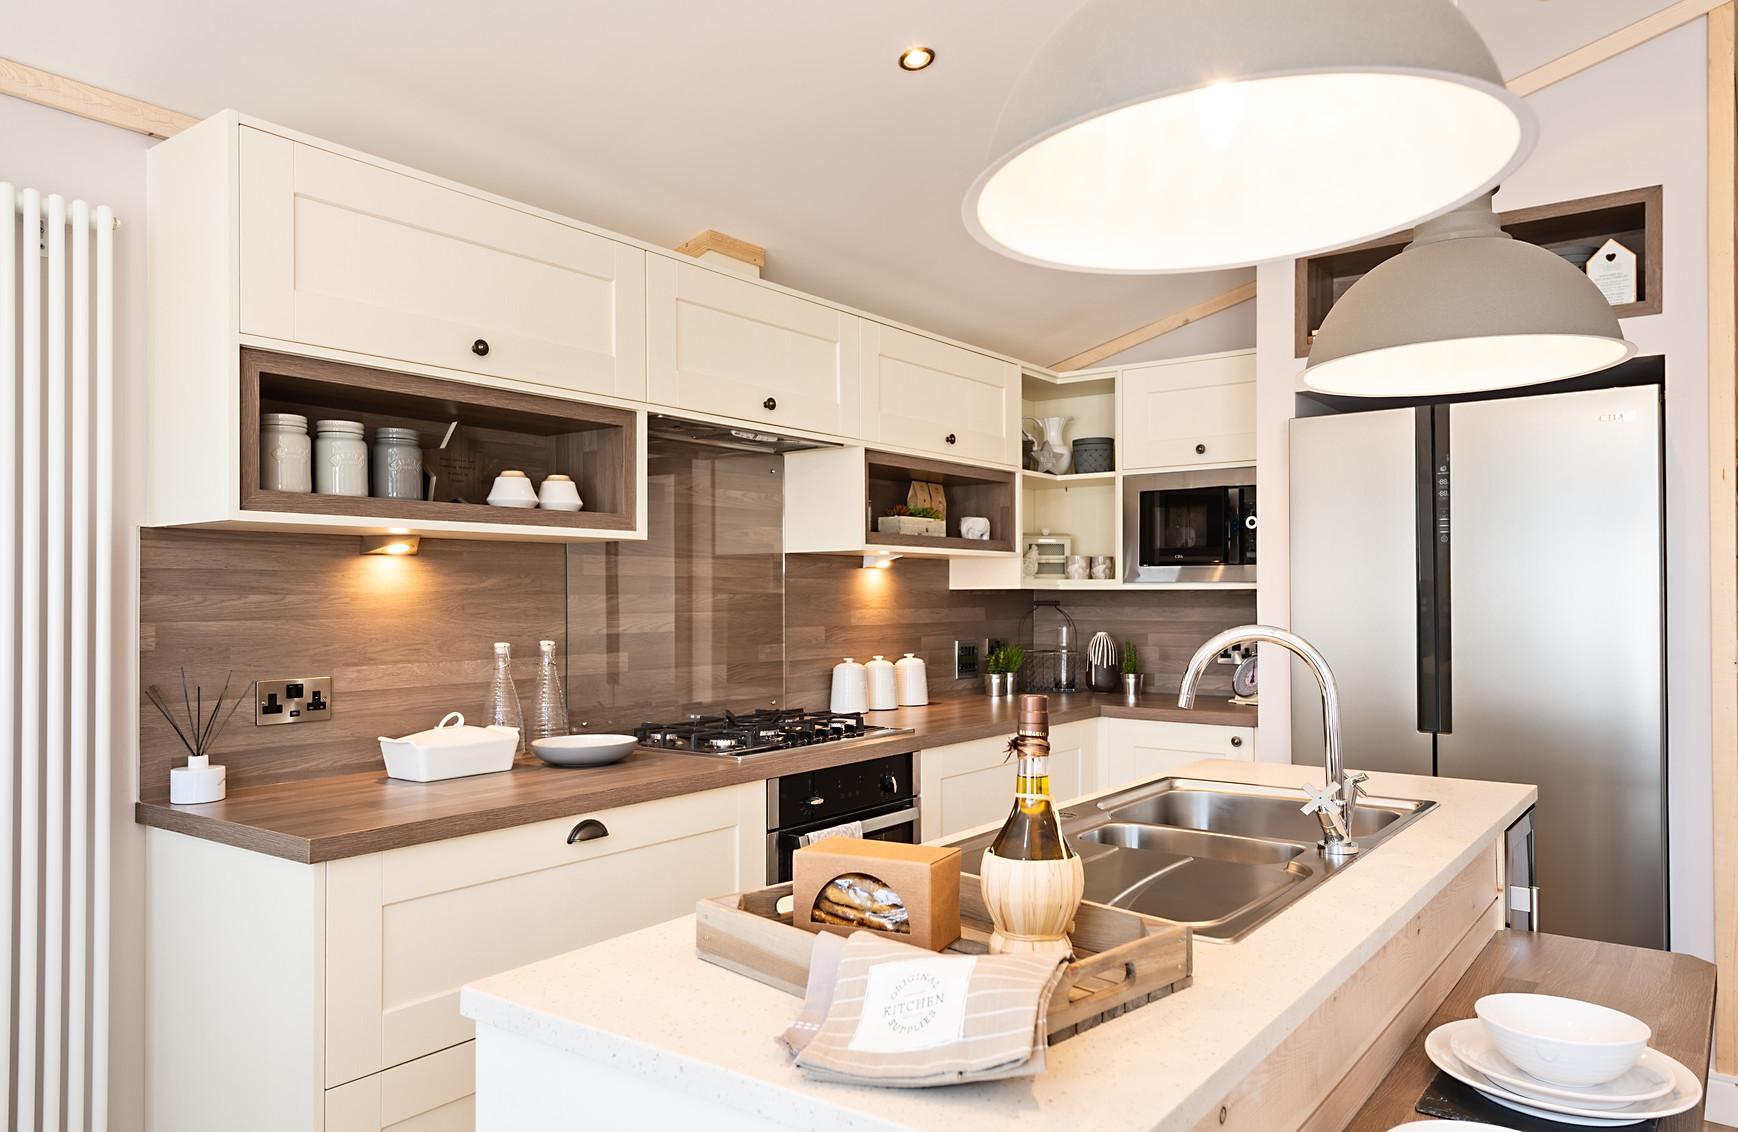 Casa Di Lusso Kitchen.jpg